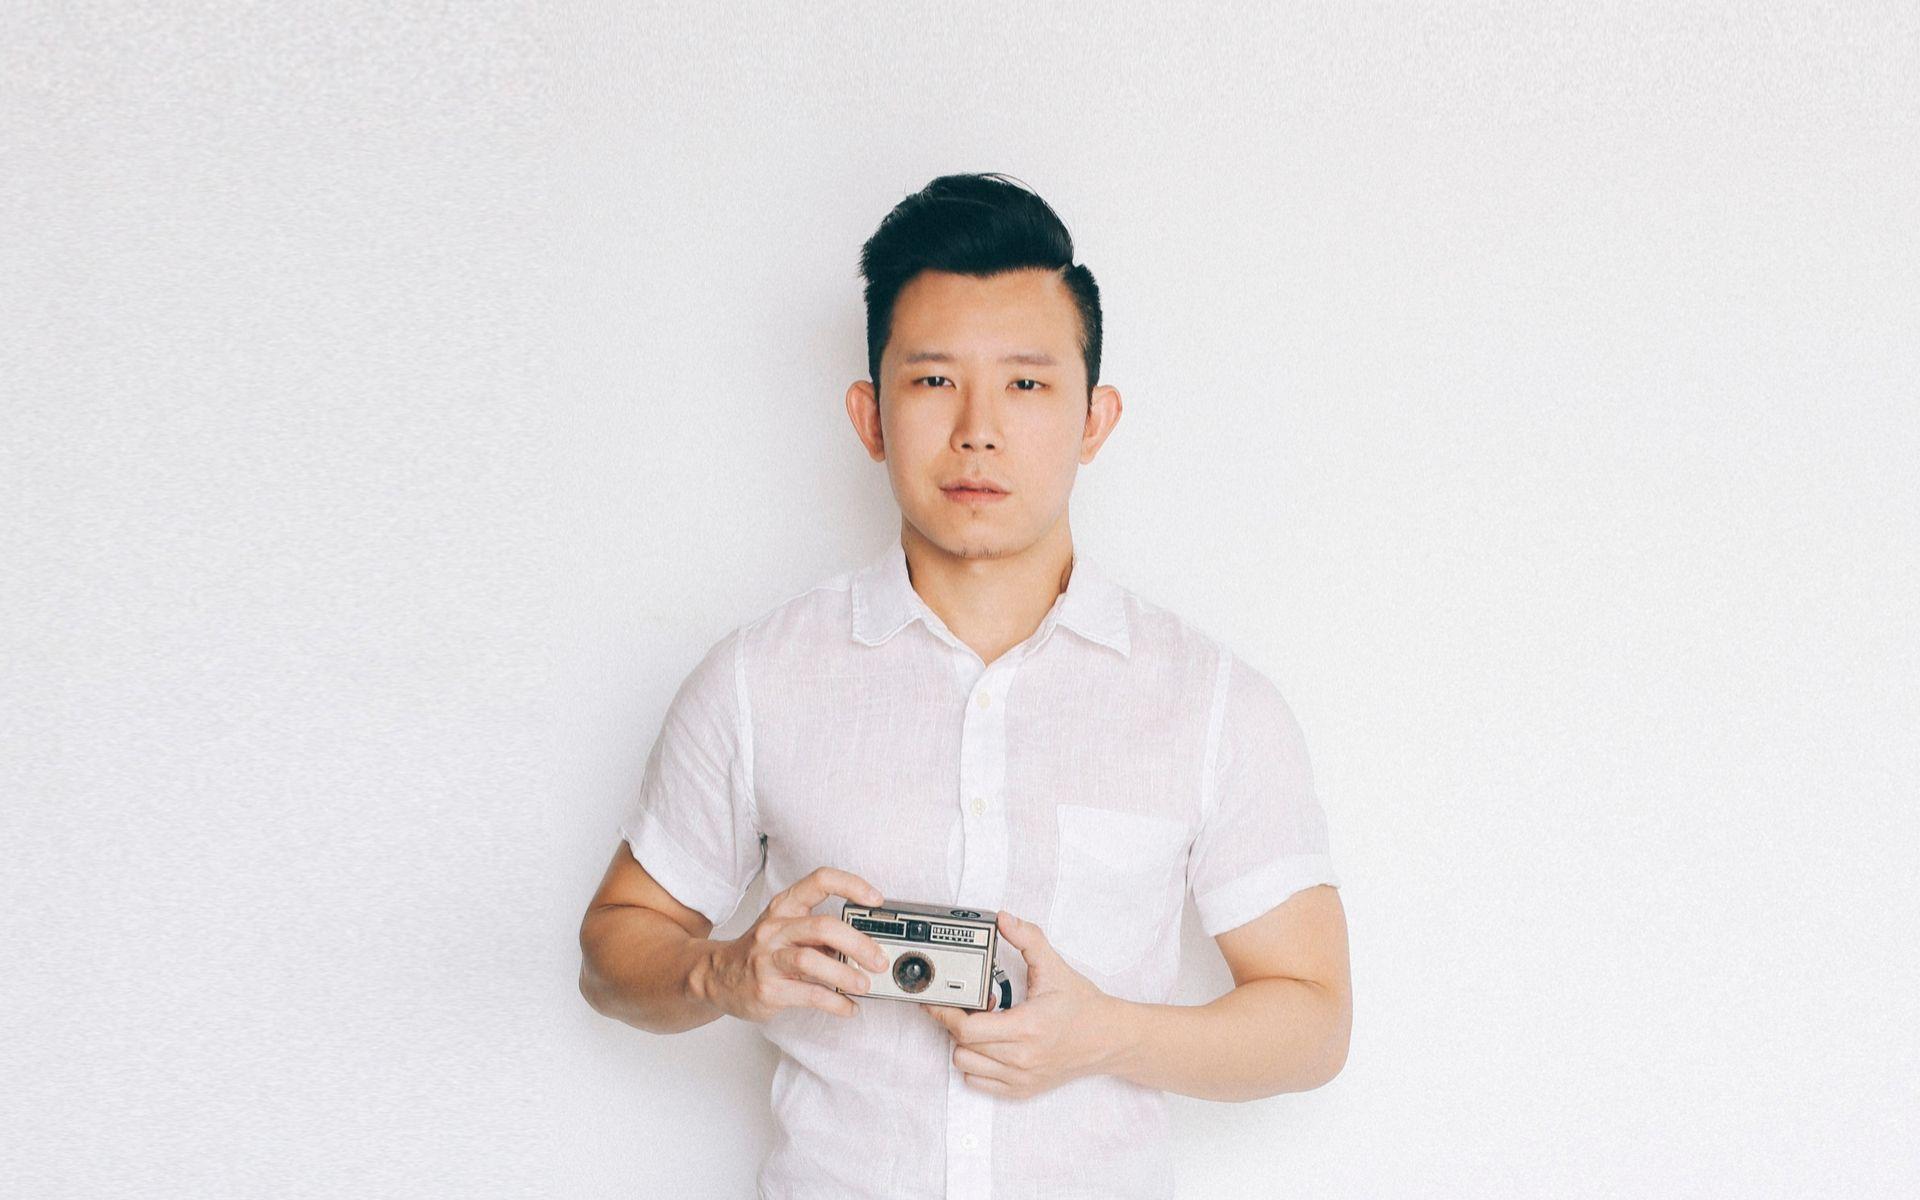 Photographer Heartpatrick Helps Us See Kuala Lumpur Through A Fresh Lens